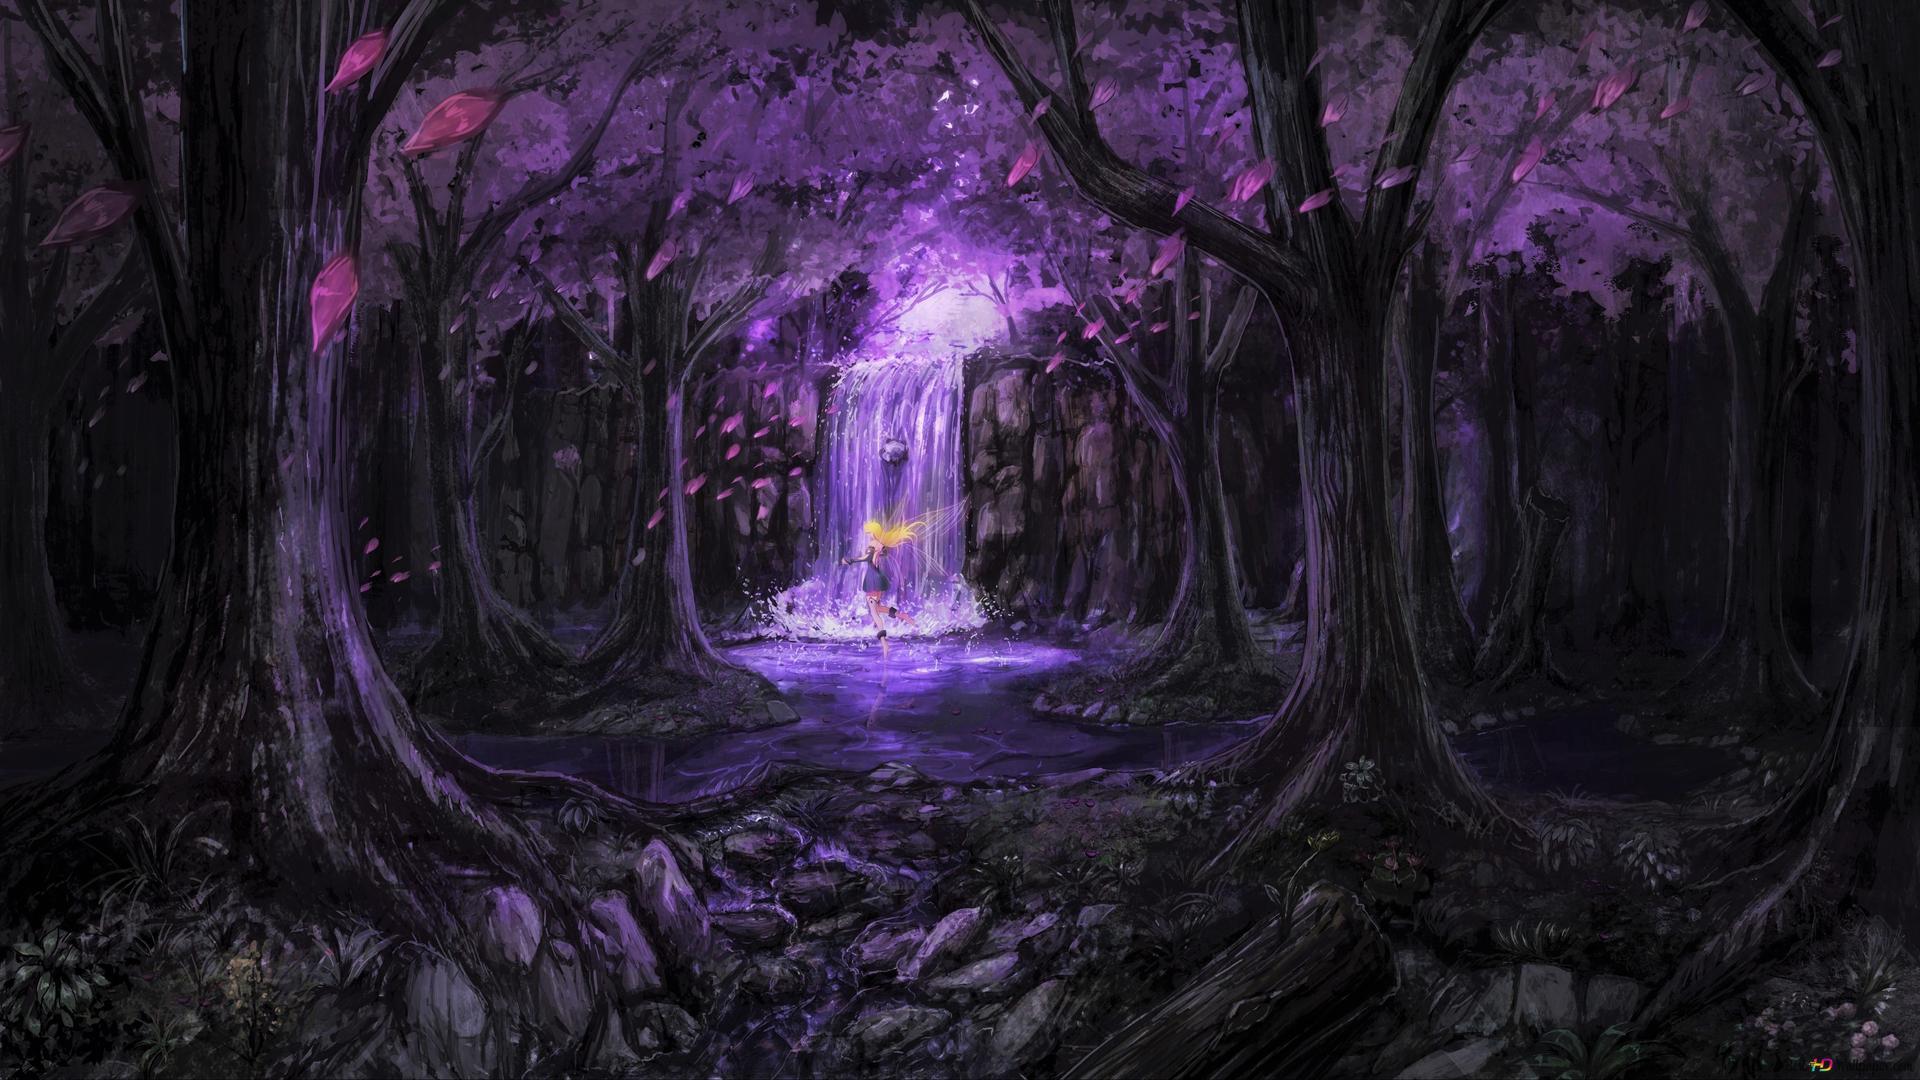 Fairy In Purple Fantasy Forest Hd Wallpaper Download